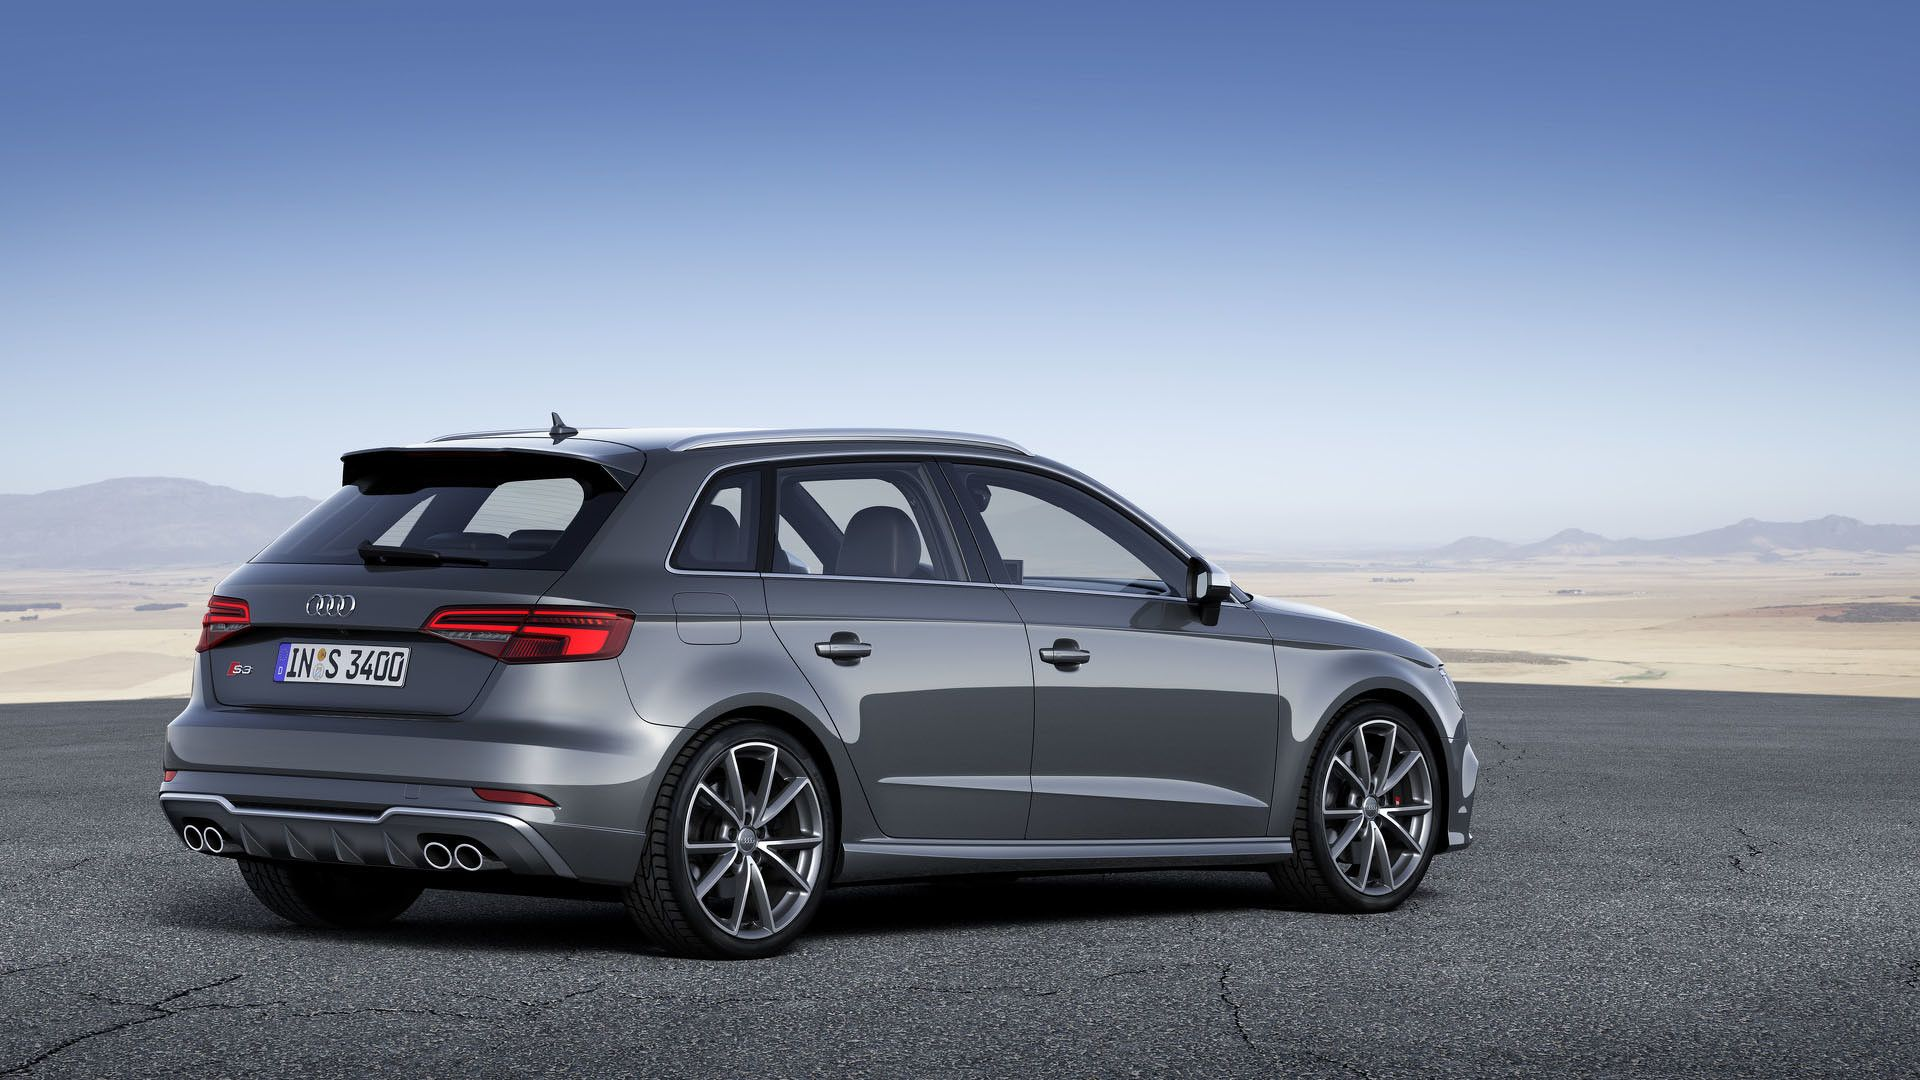 S3 2016 2017 Audi A3 Sportback Audi A3 Audi Rs3